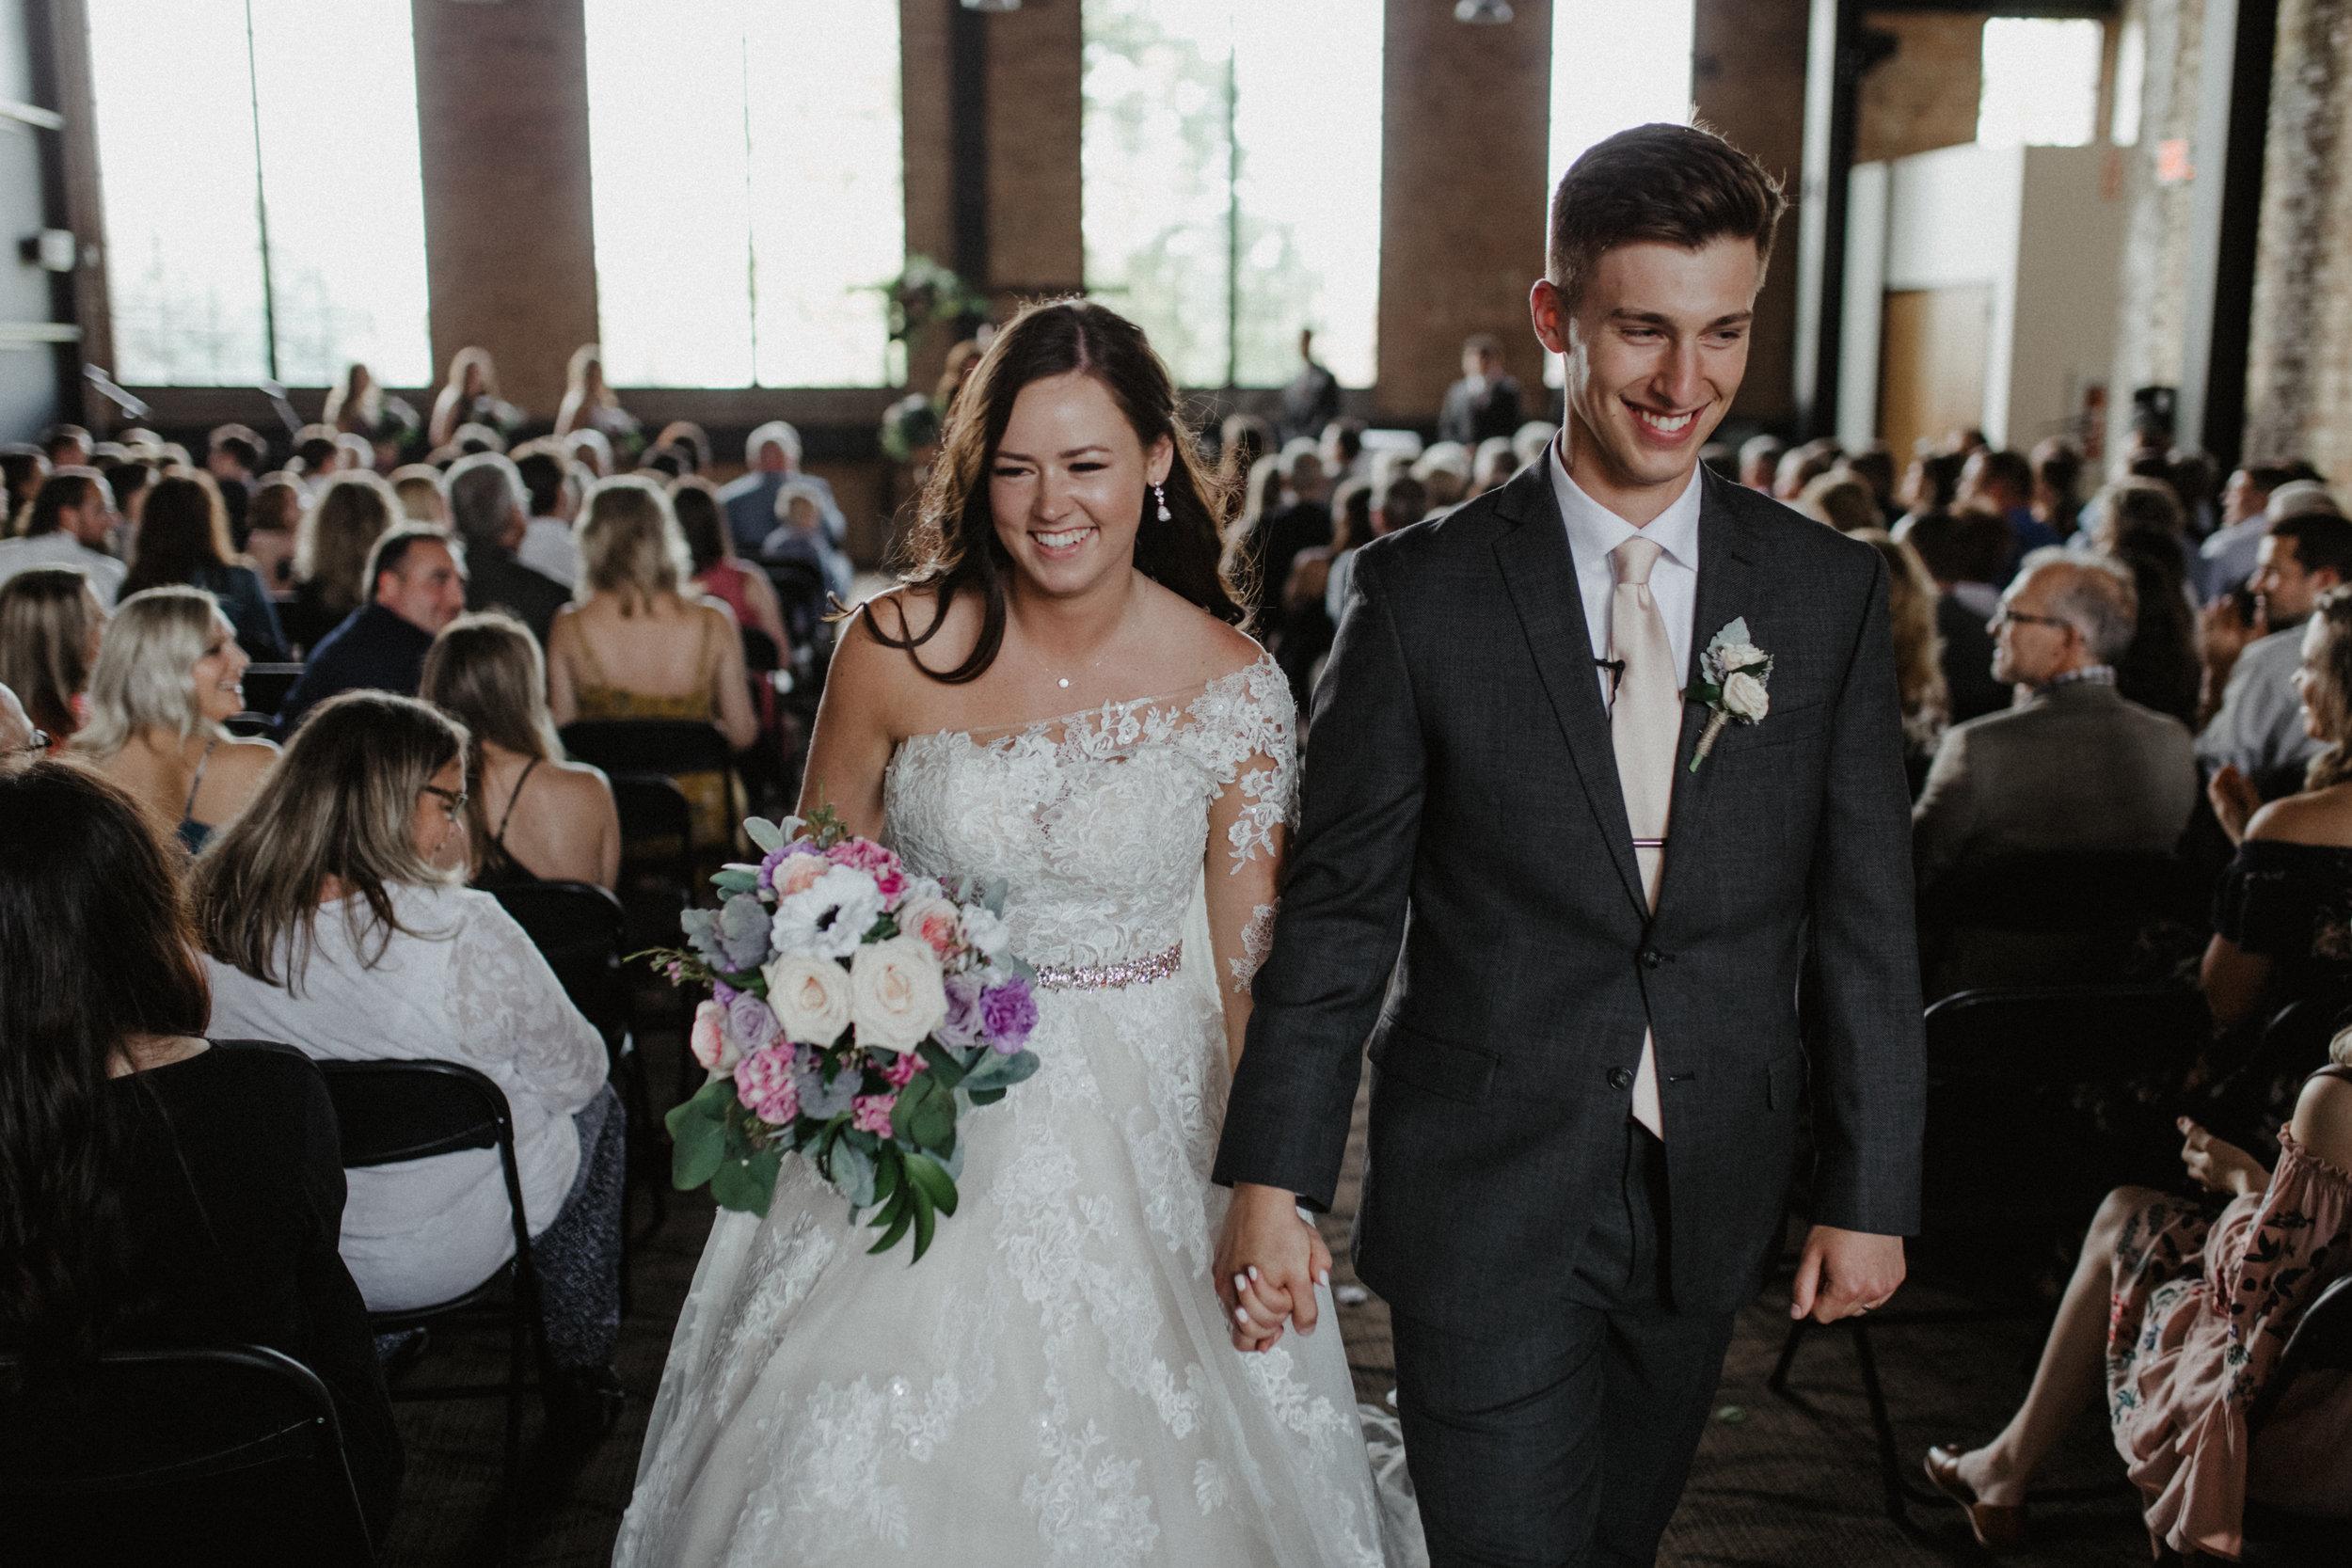 GRAYCENTOMHAMILTON-GRAND-RAPIDS-WEDDING-PHOTOGRAPHY-52.jpg